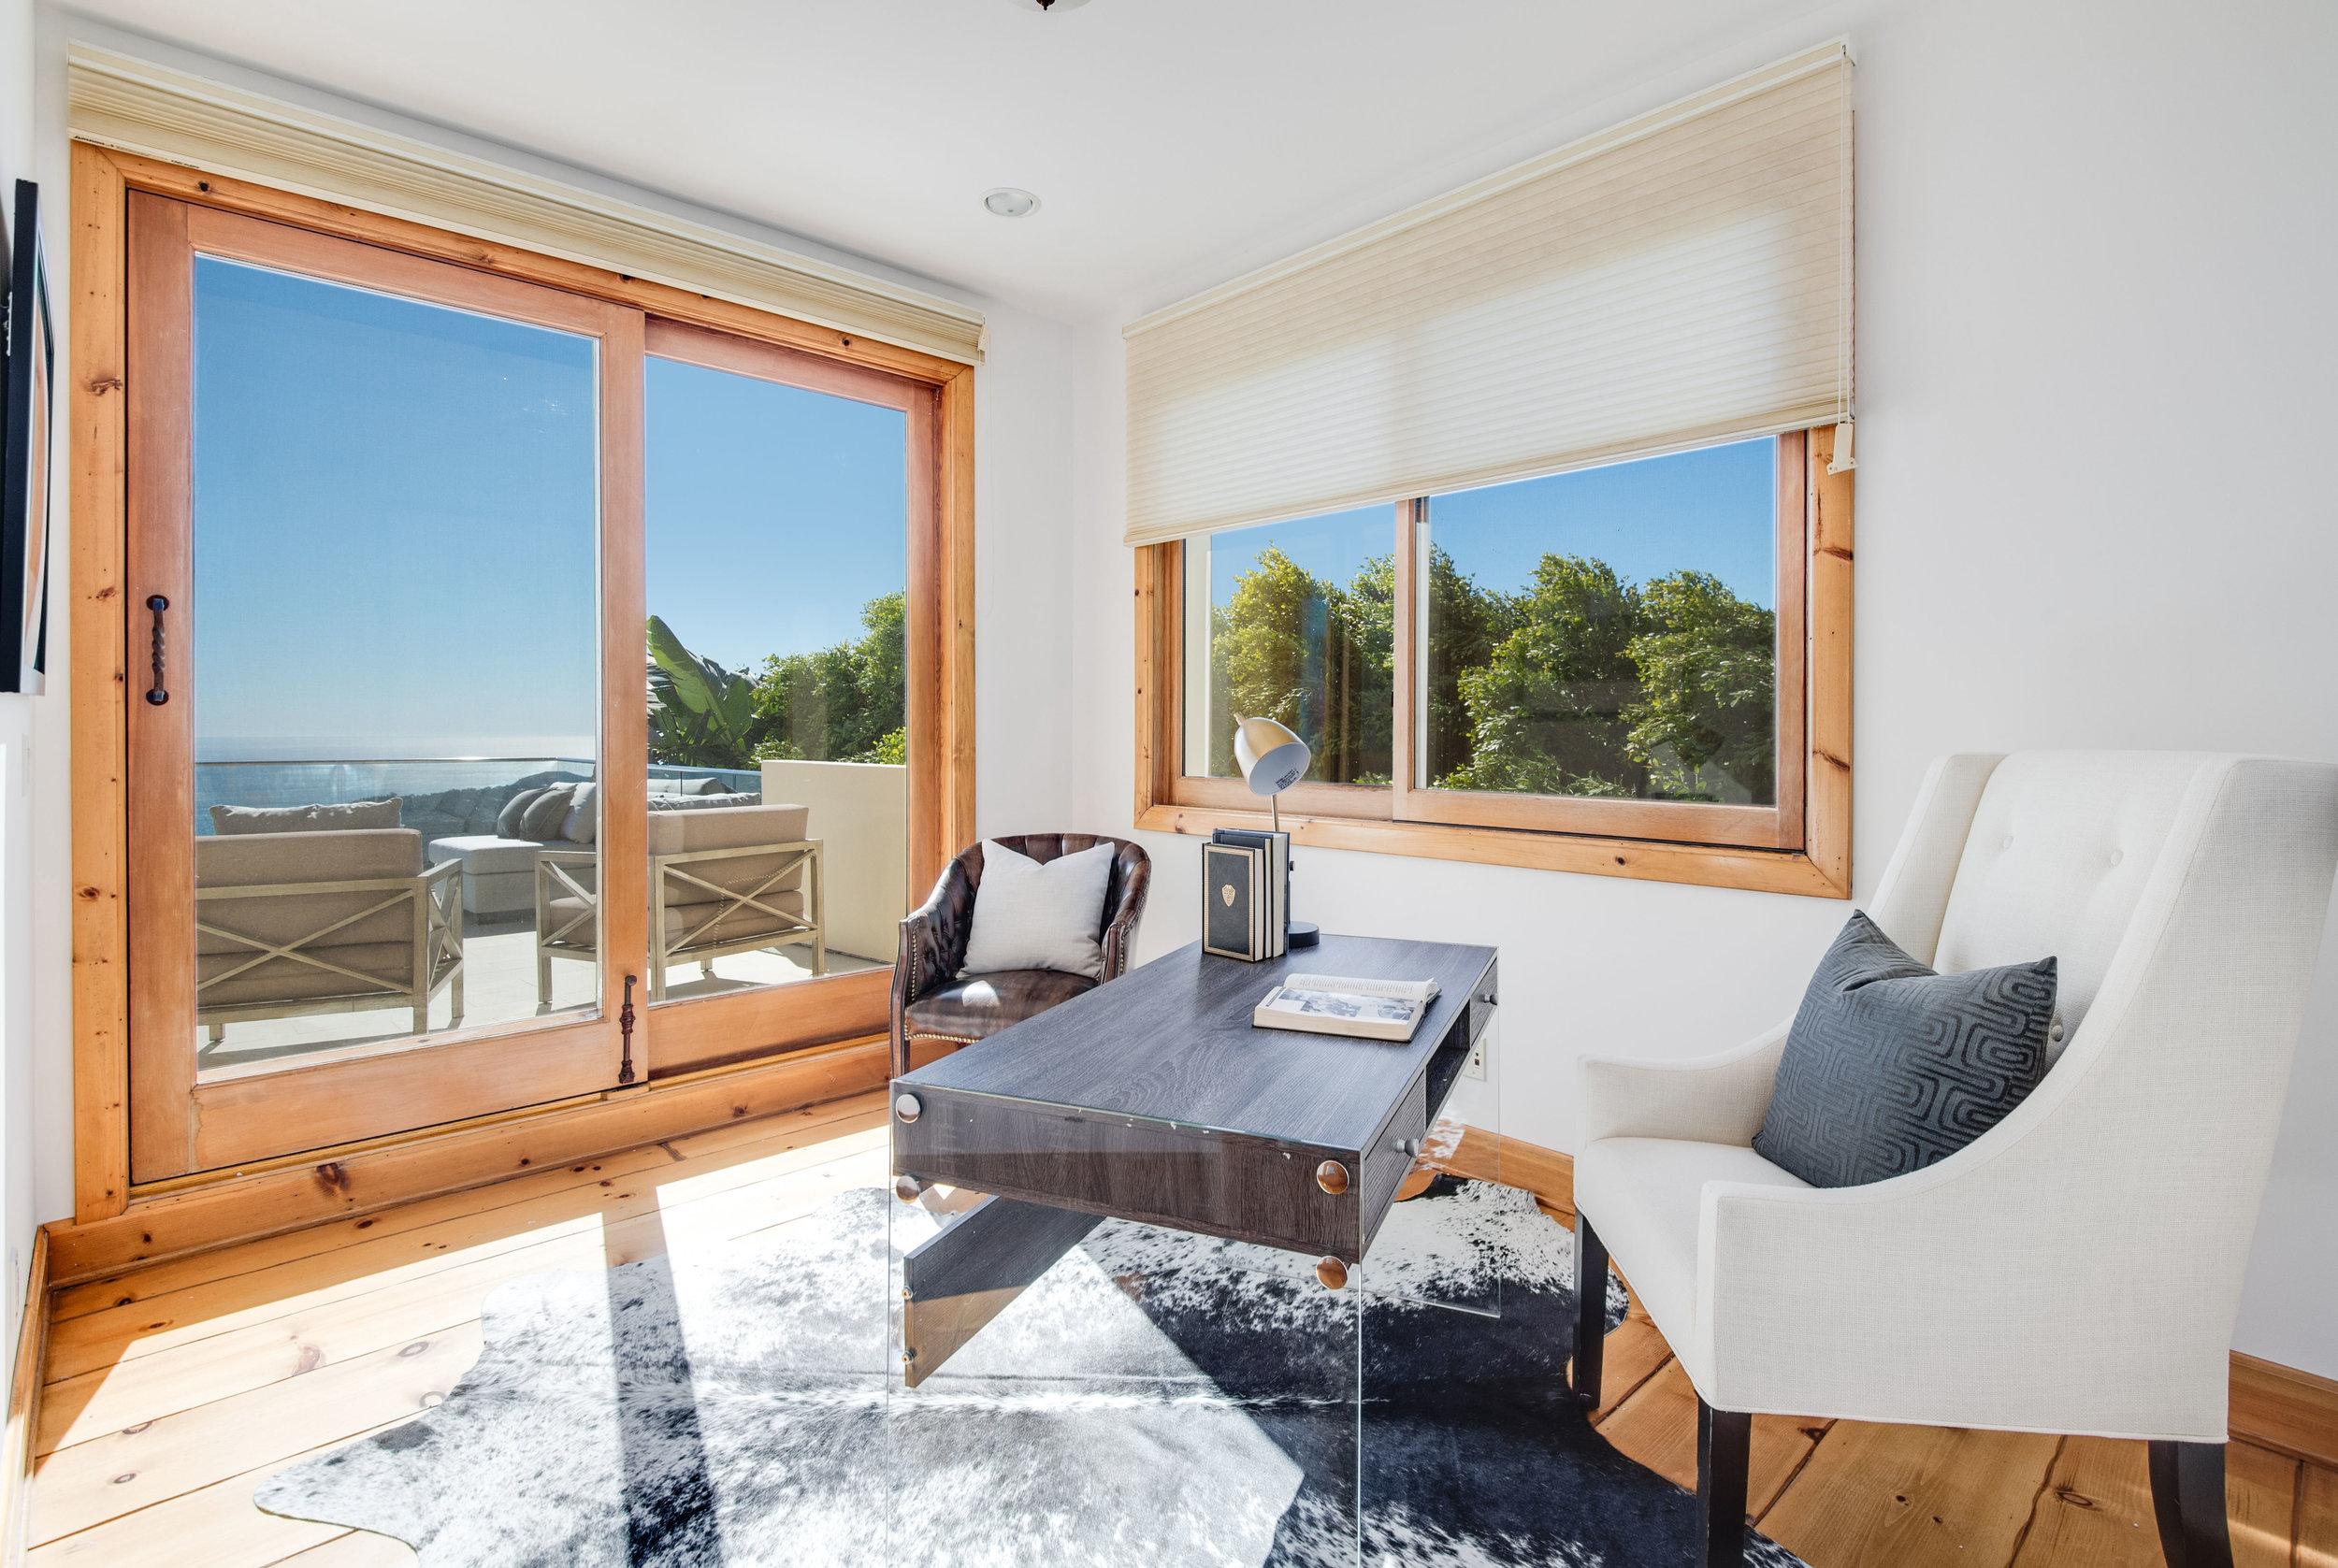 023 Ocean View Office 27475 Latigo Bay View Drive For Sale Lease The Malibu Life Team Luxury Real Estate.jpg